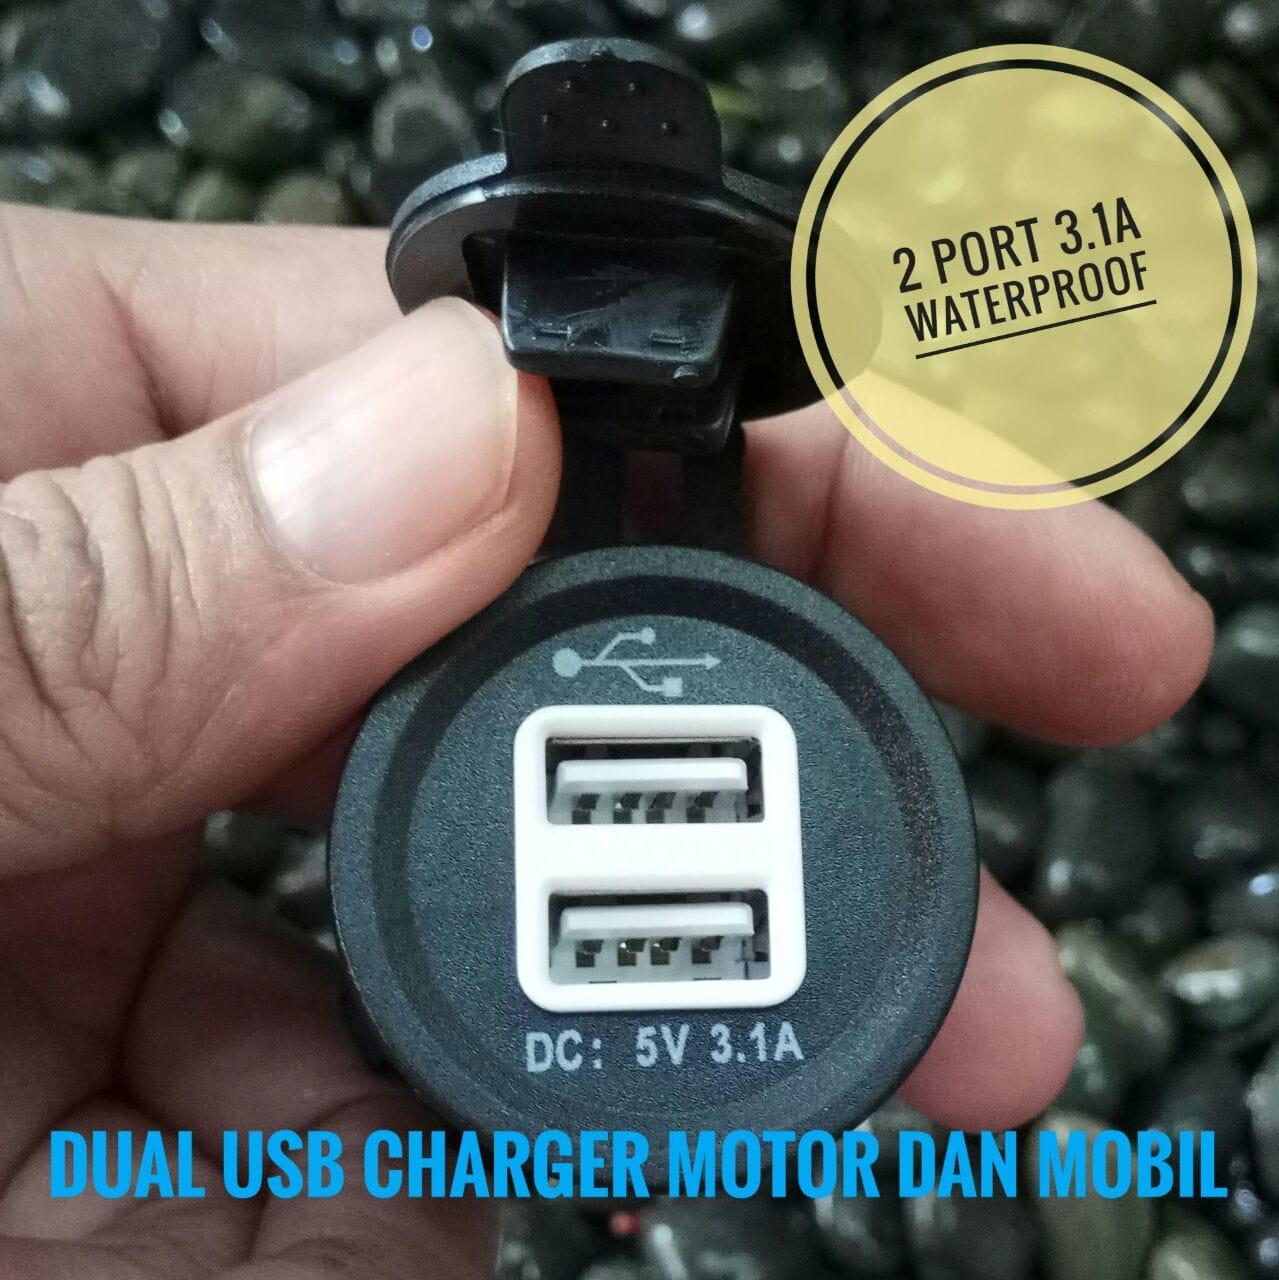 Jual Dual Usb Charger Motor Mobil Waterproof 31a Cocok Buat Nmax Hp Aerox Dll Tukura Tokopedia